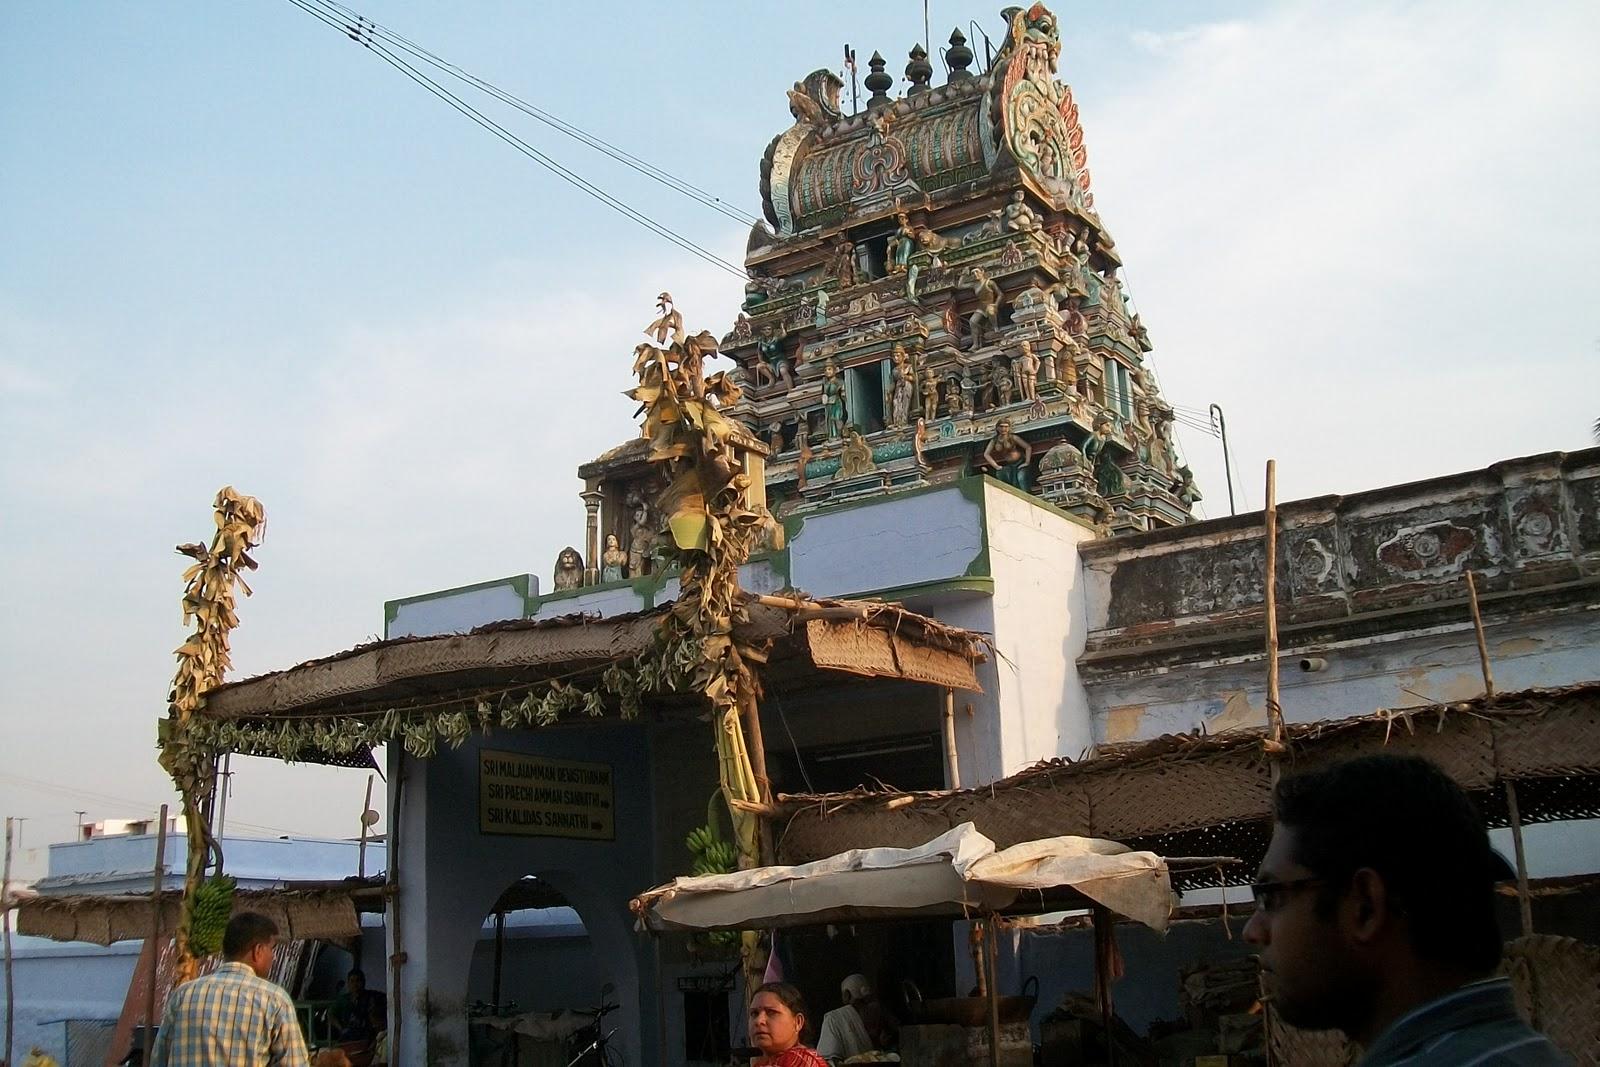 nrameshrao: Kodumudi Temple